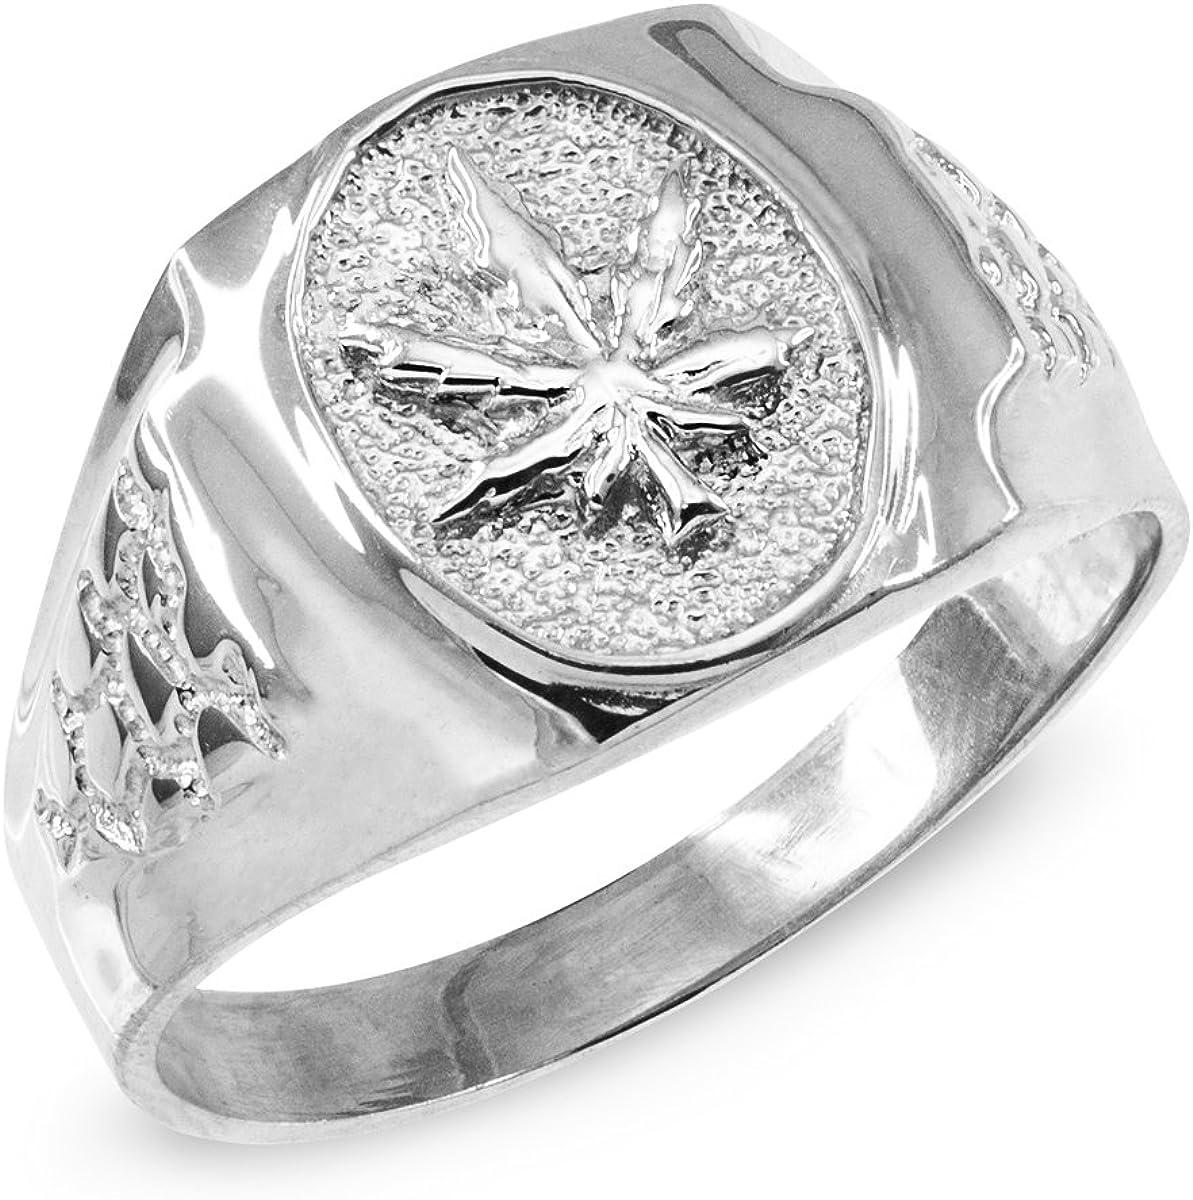 Mens Sterling Silver Marijuana Leaf Cannabis Ring Little Treasures